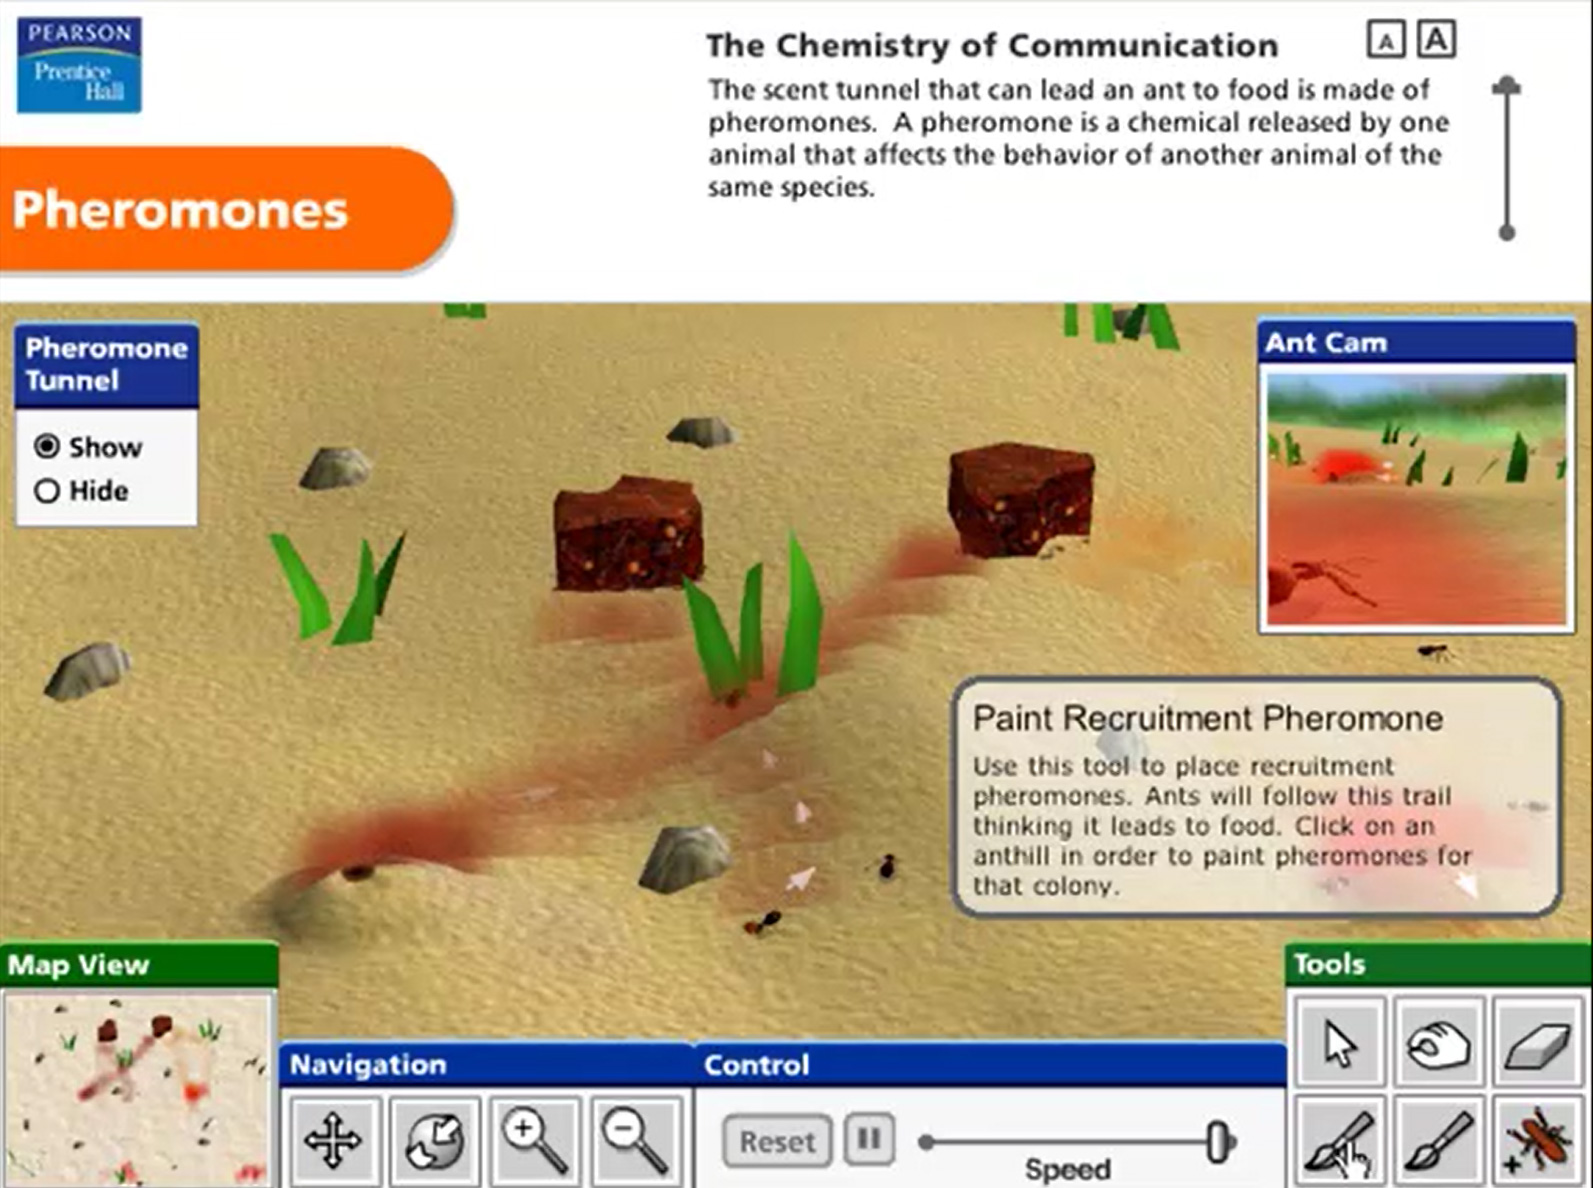 Pearson Education Virtual Science Experiments by ForgeFX Simulations, Pheromones Training Simulator